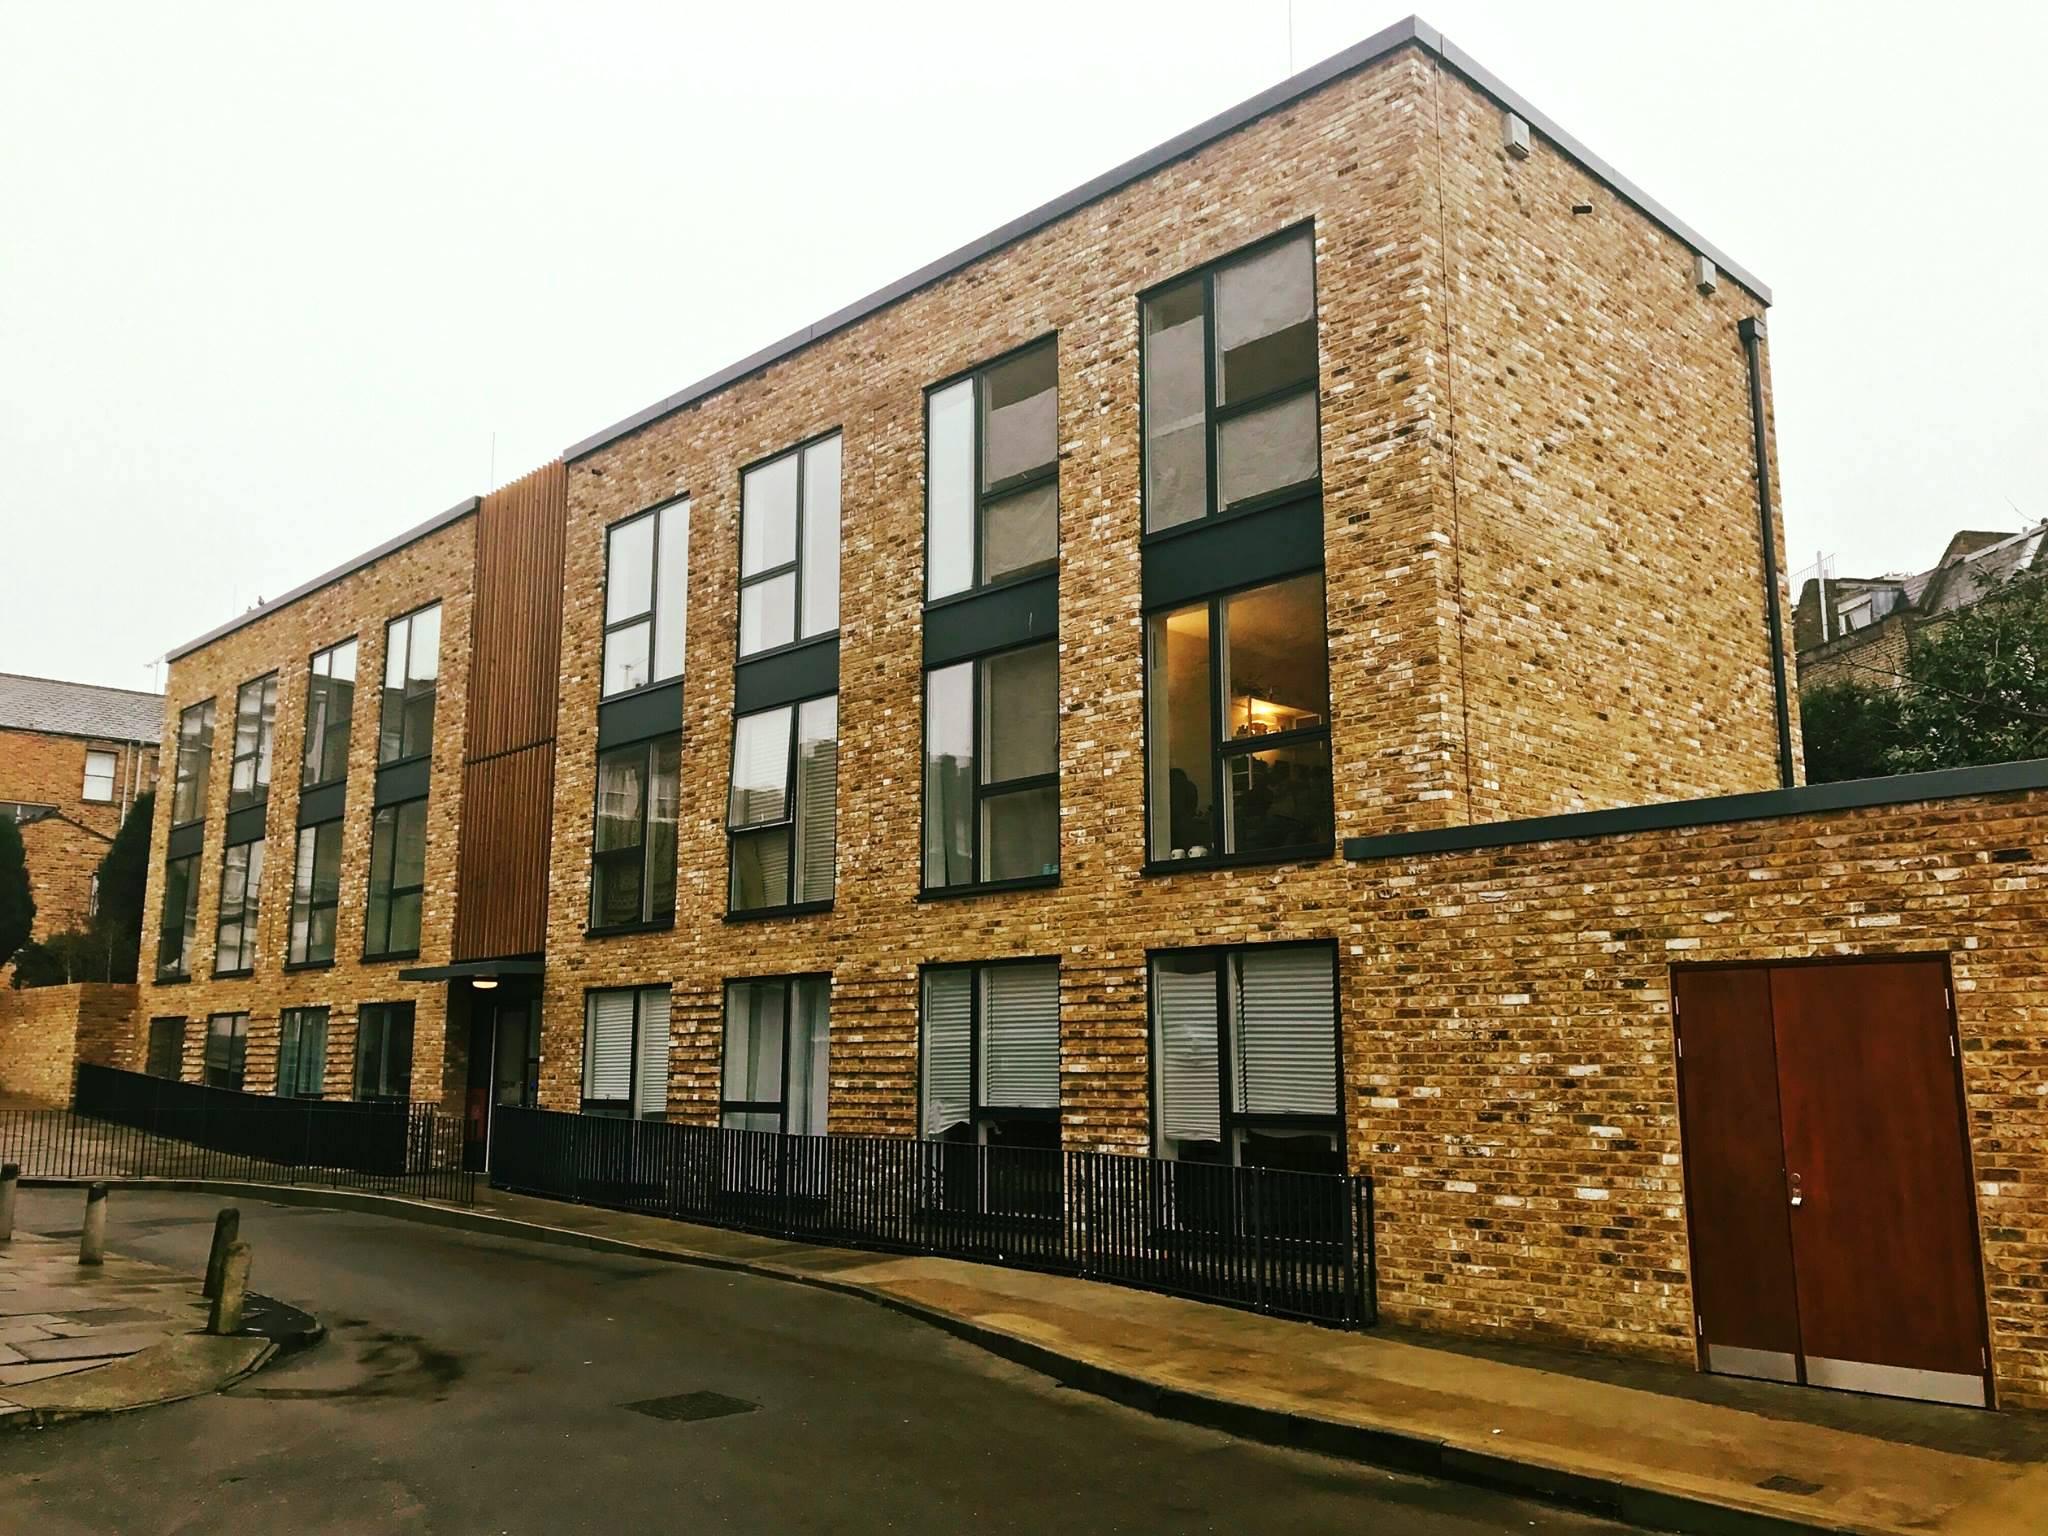 sadiq khan to invest £25m to bring 1,000 'pocket homes' to london